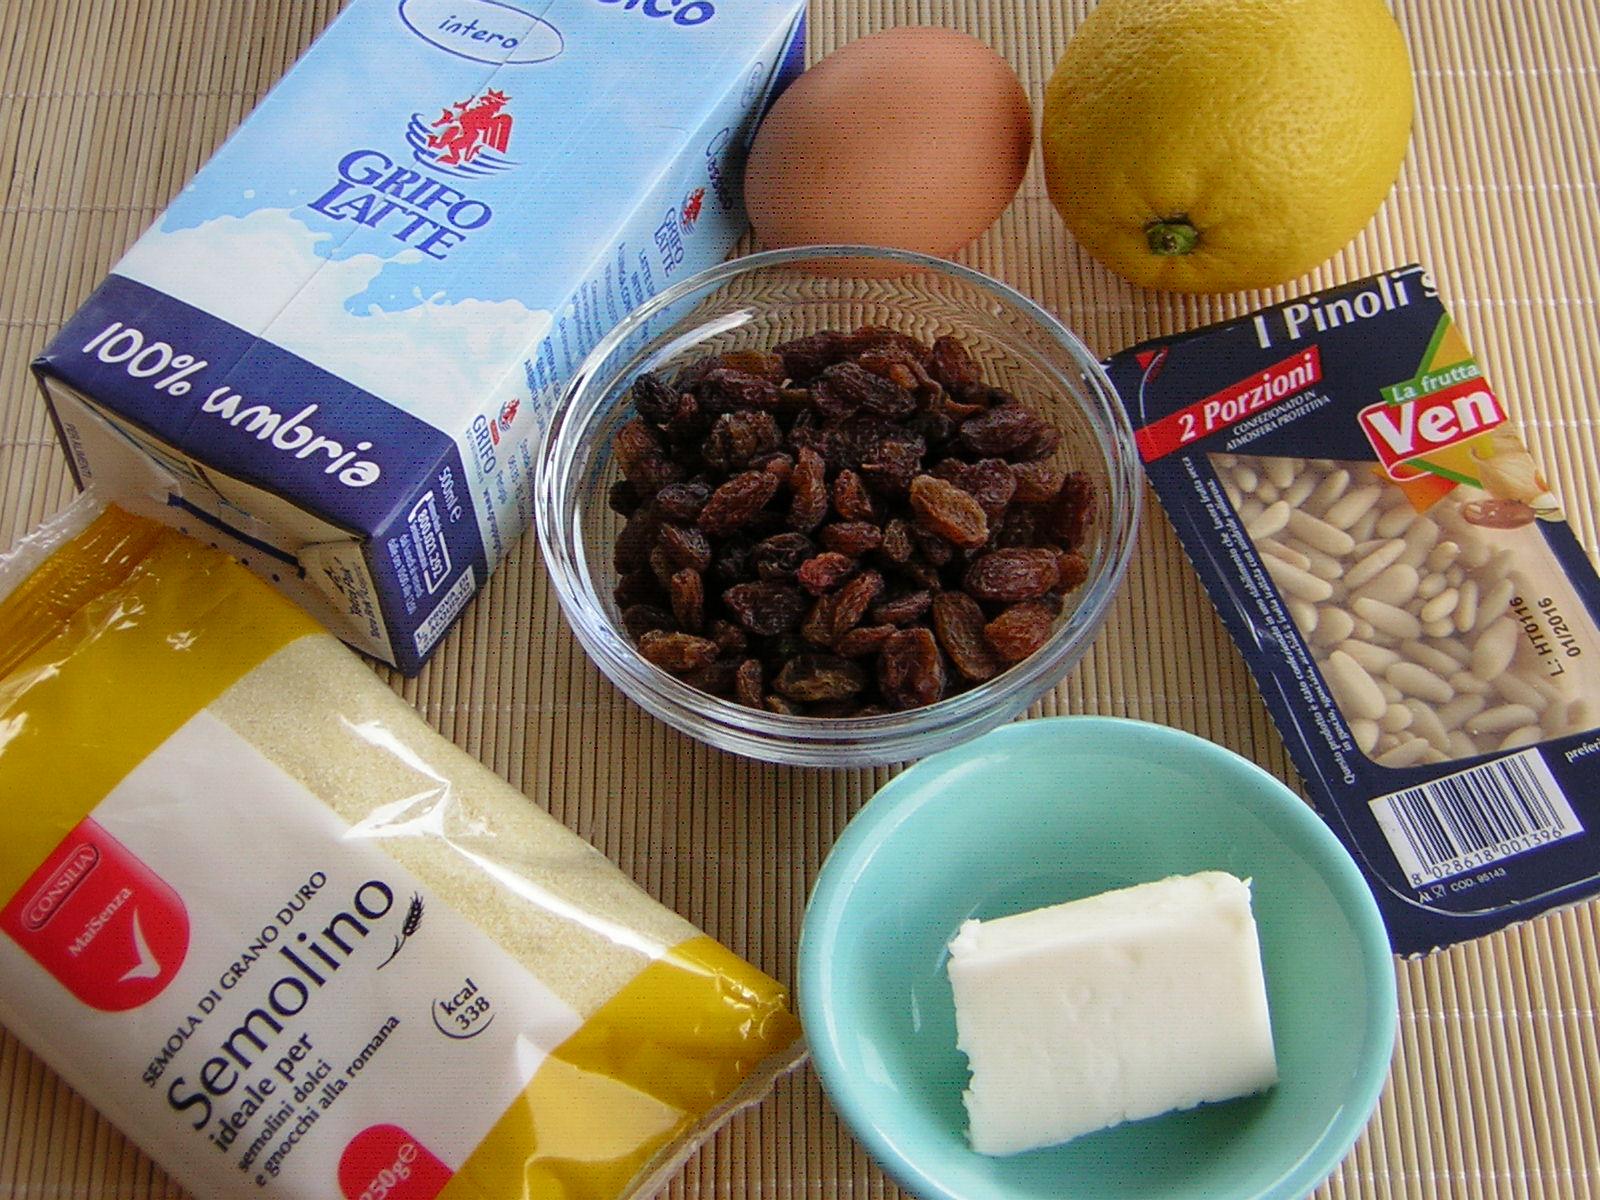 ingredienti per la torta di semolino